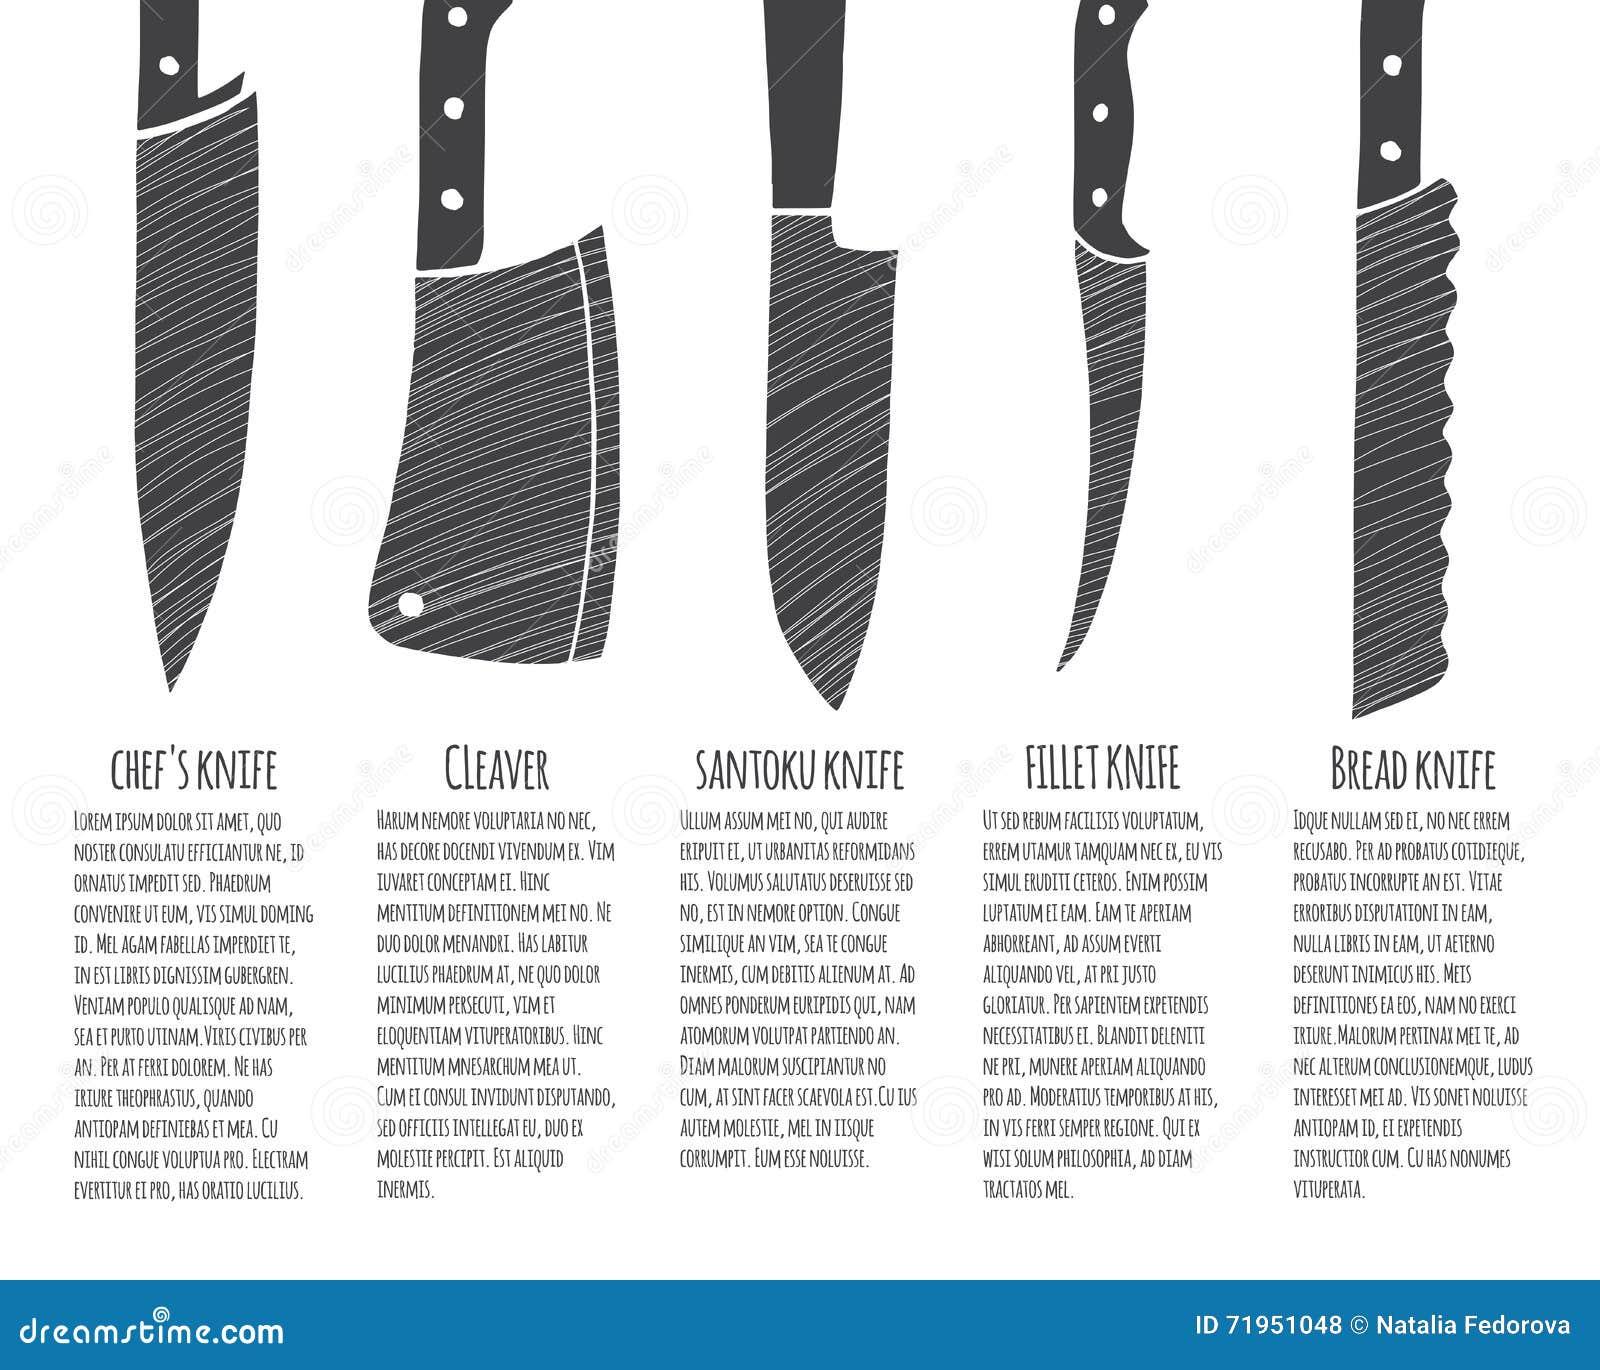 Tipi di coltelli da cucina illustrazione vettoriale - Coltelli da cucina ...